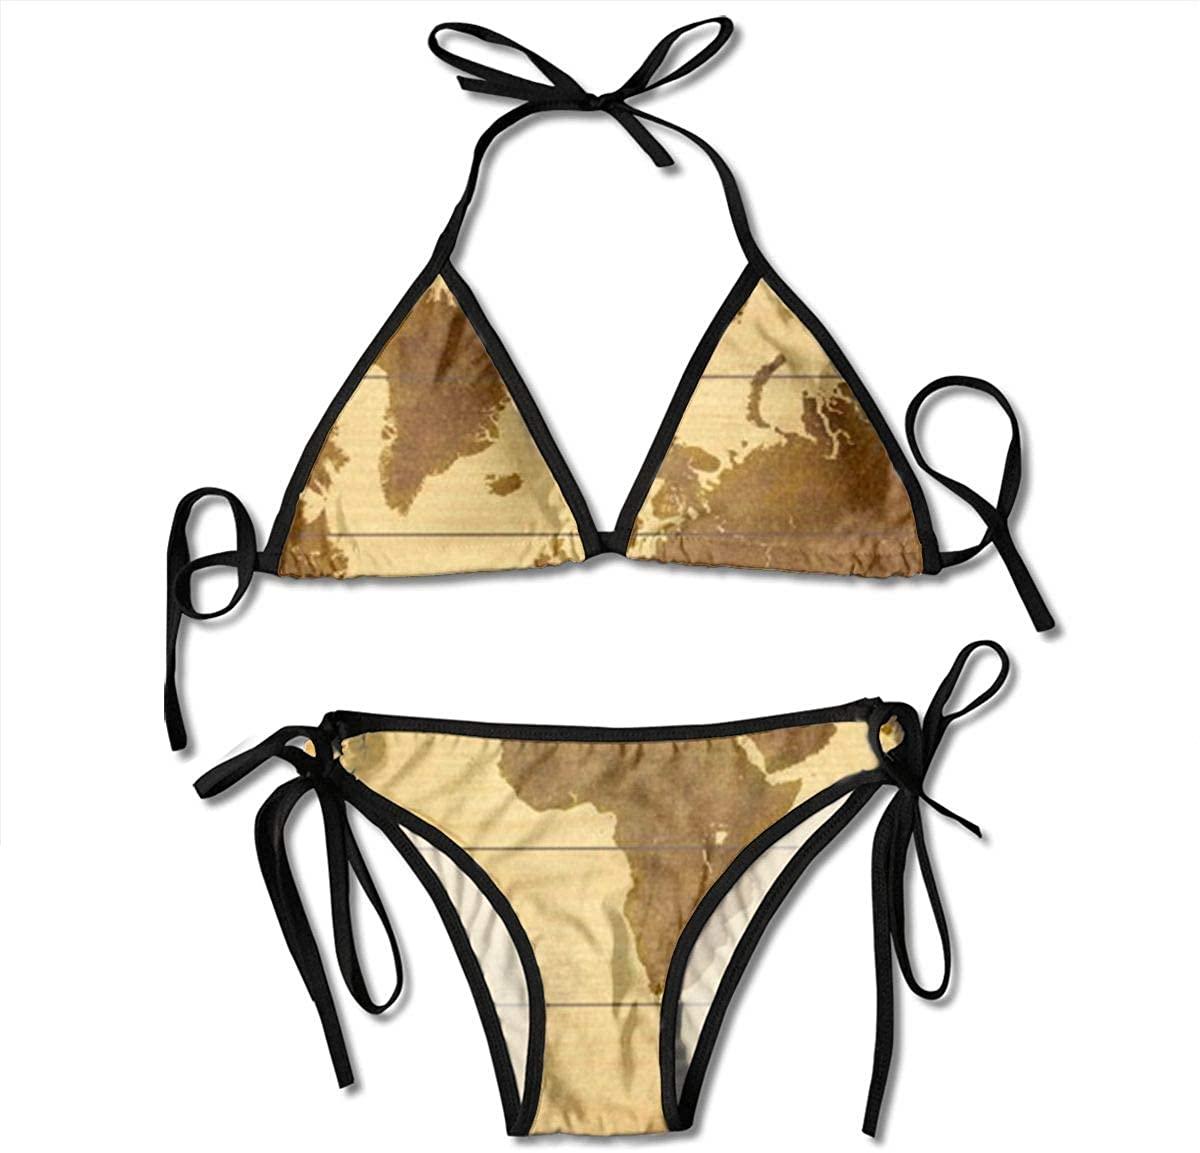 ZMagwa Womens String Triangle Bikini Set Two Piece Large Black World Swimsuit